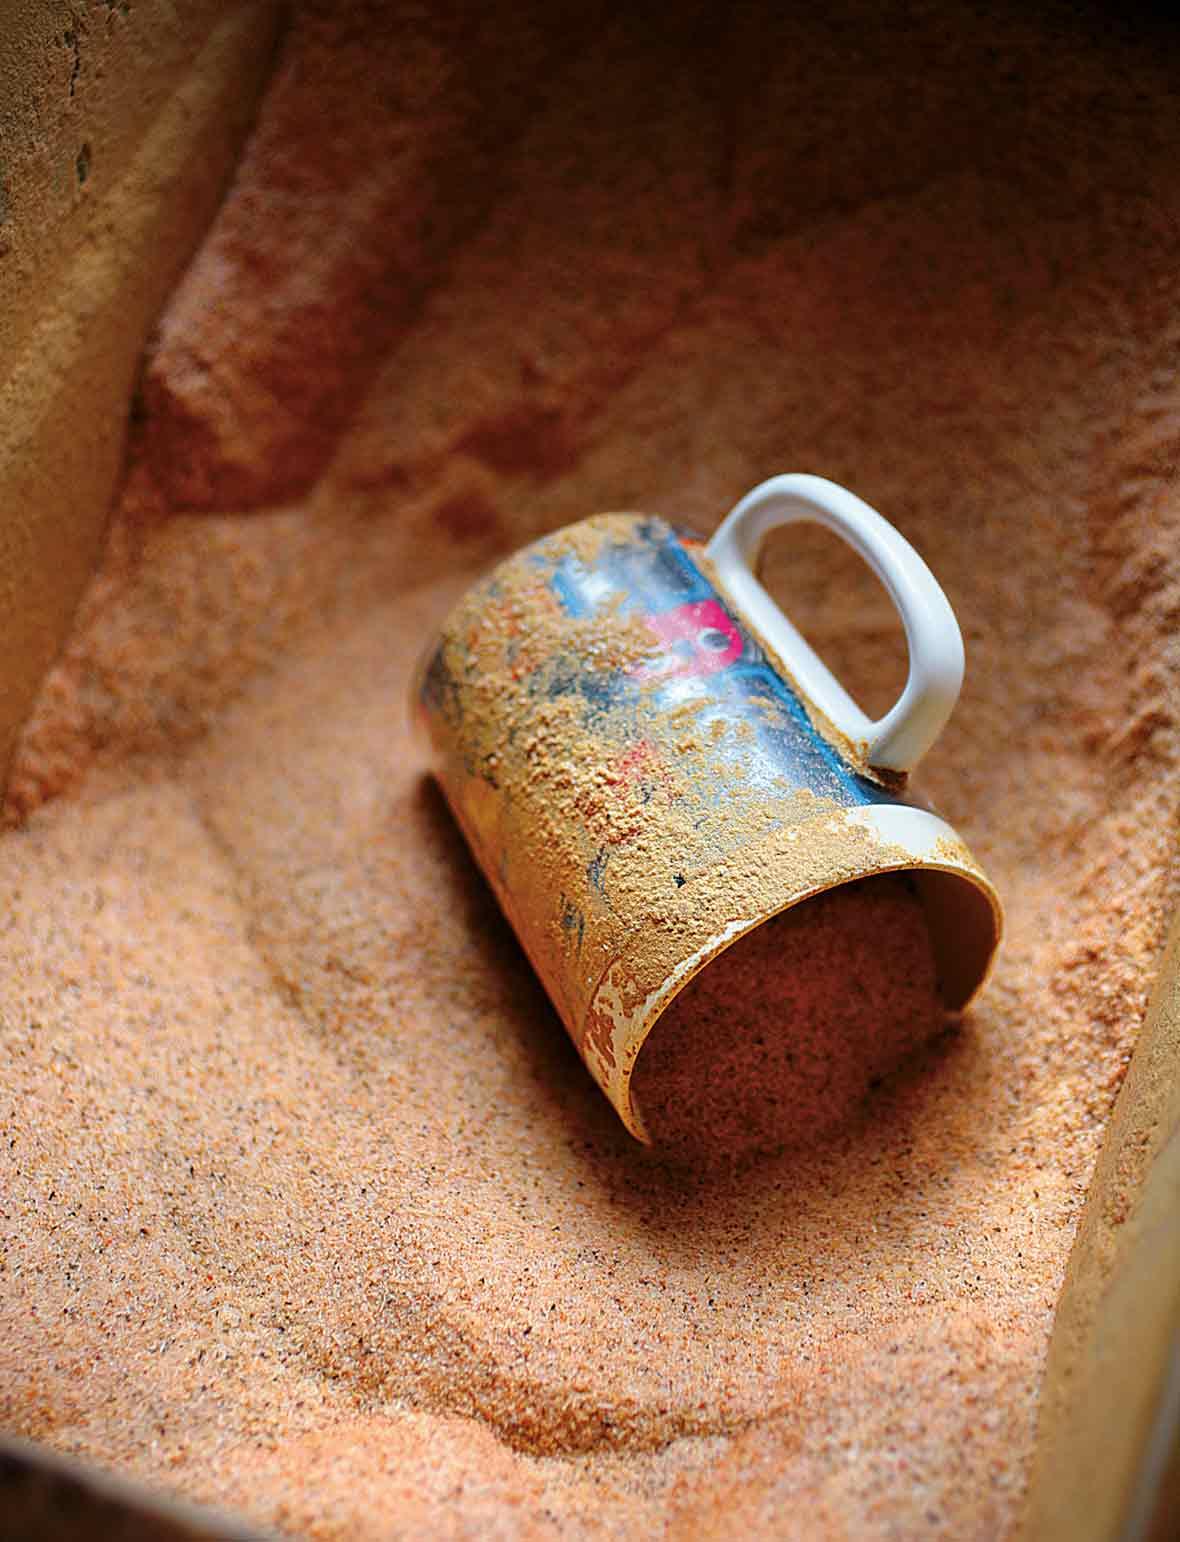 A mug lying on its side in a bin of cajun spice mix